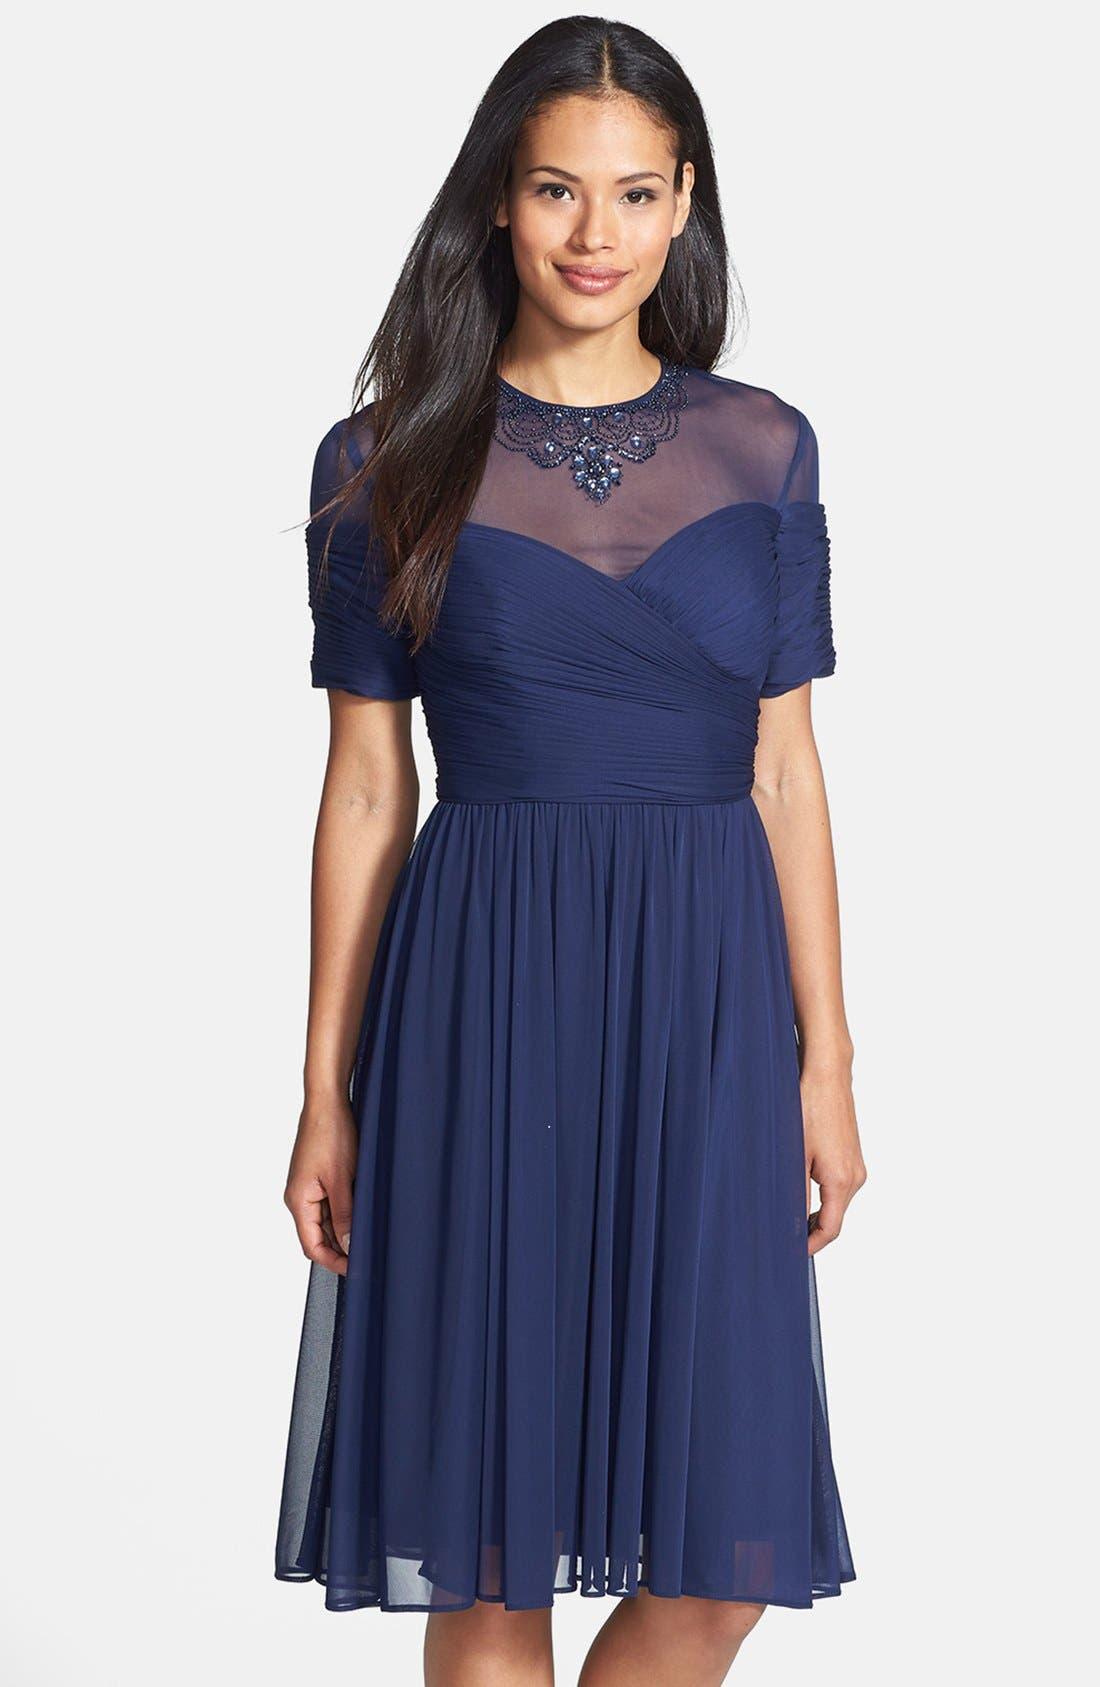 Main Image - Alex Evenings Embellished Illusion Yoke Chiffon Fit & Flare Dress (Regular & Petite)